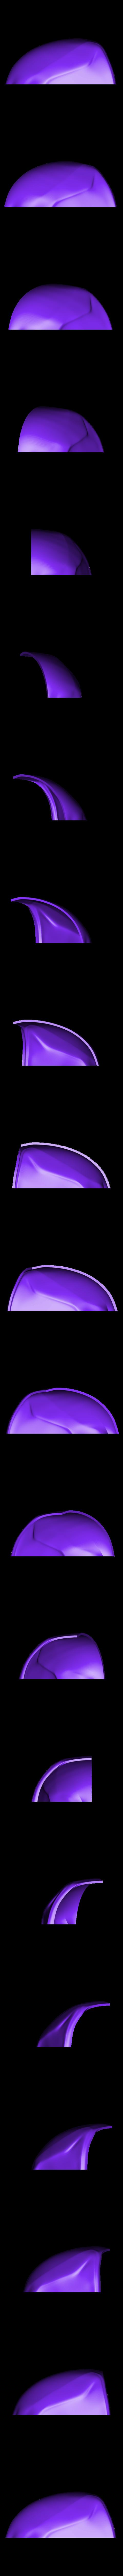 Part_2_v2.stl Download free STL file Deathstroke Mask with two eyes • 3D printing model, VillainousPropShop